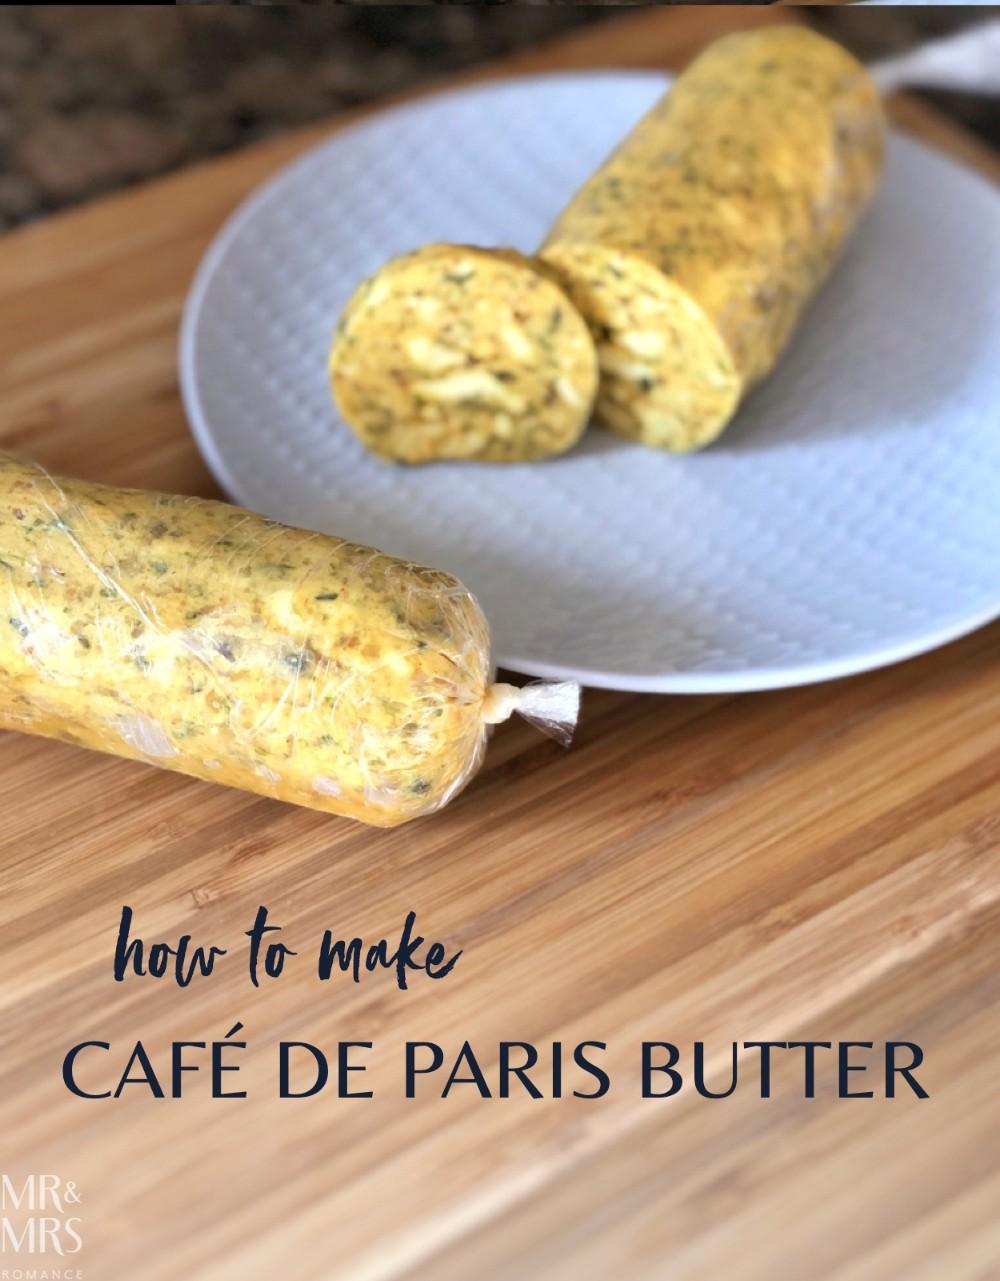 Cafe de paris butter recipe